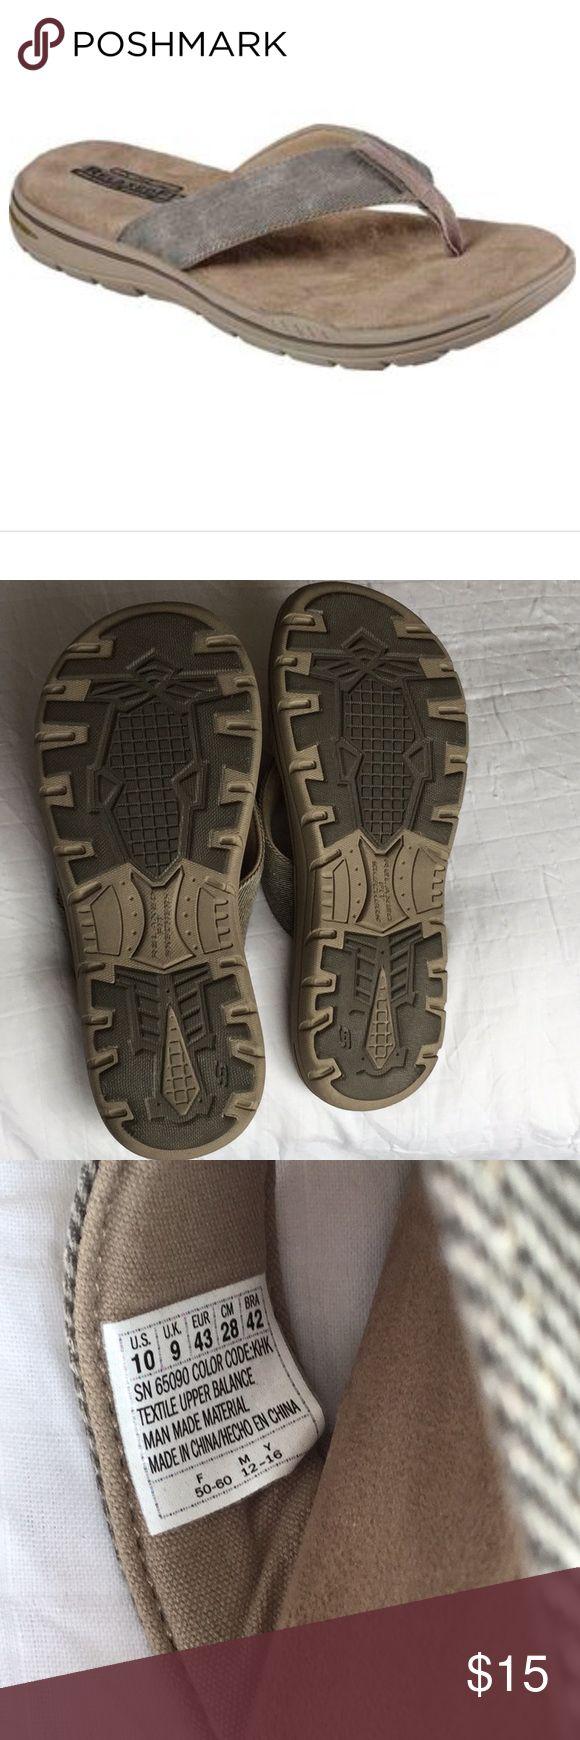 Men's Skechers Relaxed Fit Memory Foam Brand new. No box. Slippers/Flipflops Skechers Shoes Sandals & Flip-Flops